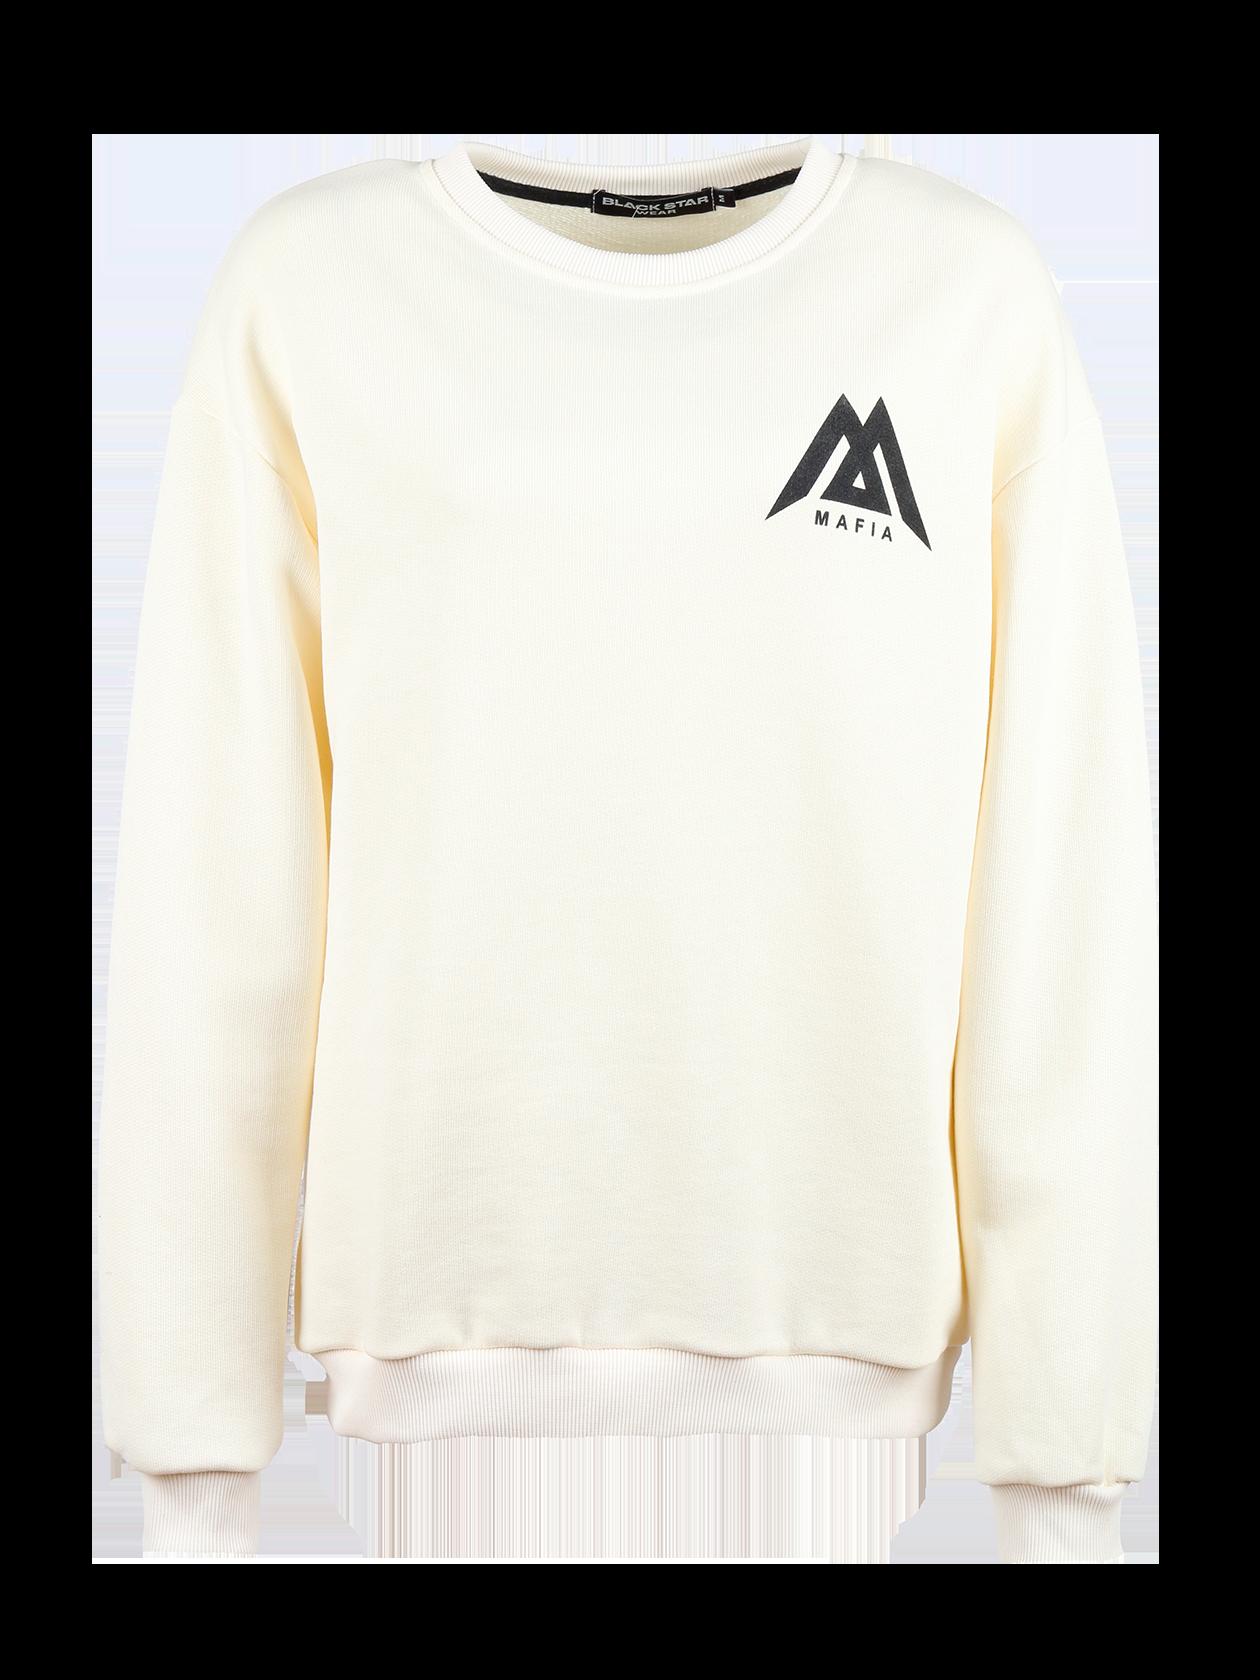 Womens sweatshirt Black Star Mafia<br><br>size: L<br>color: White<br>gender: female